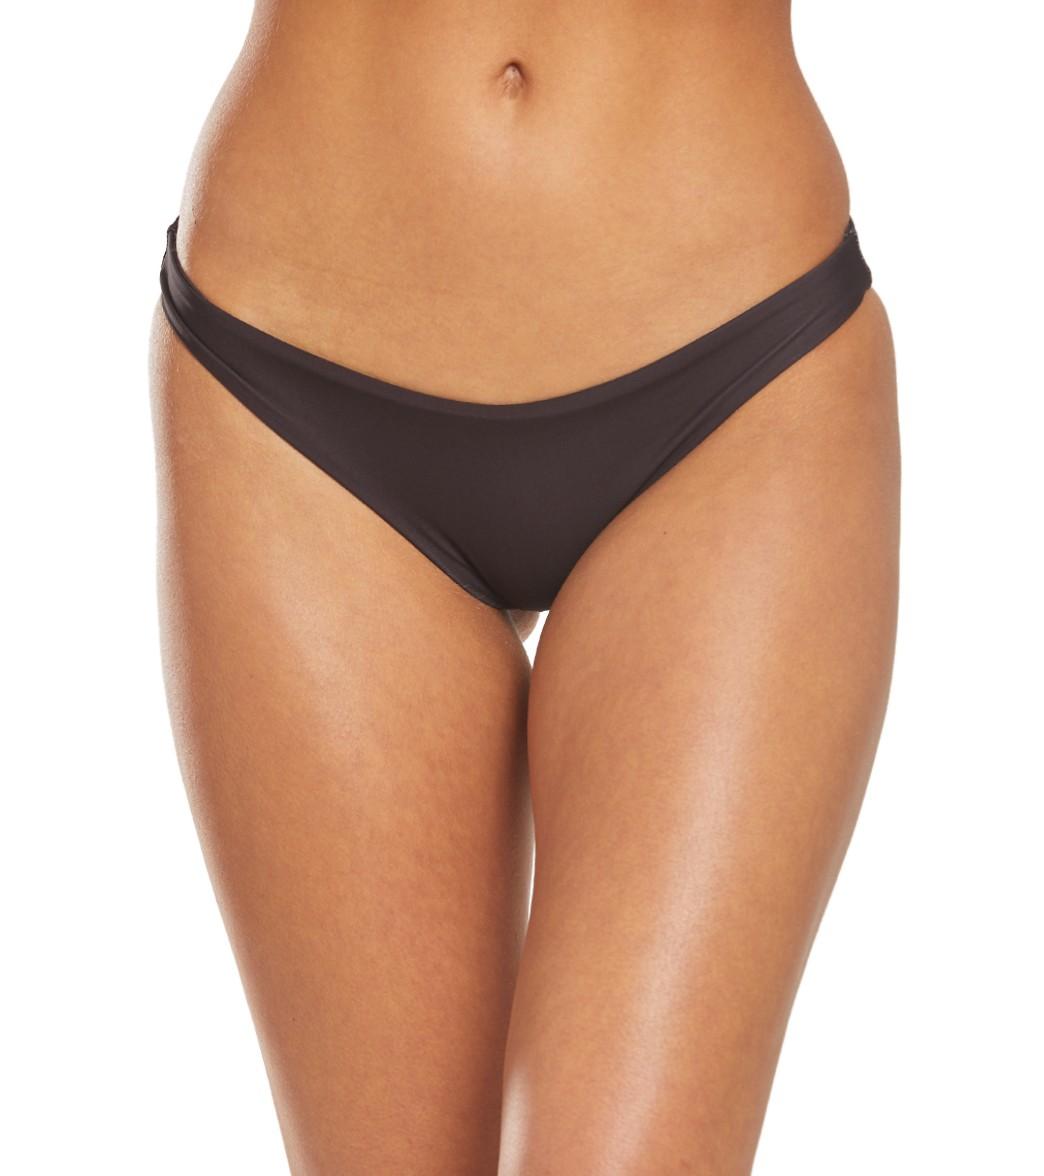 Hurley Women's Quick Dry Pendleton Acadia Moderate Coverage Bikini Bottom